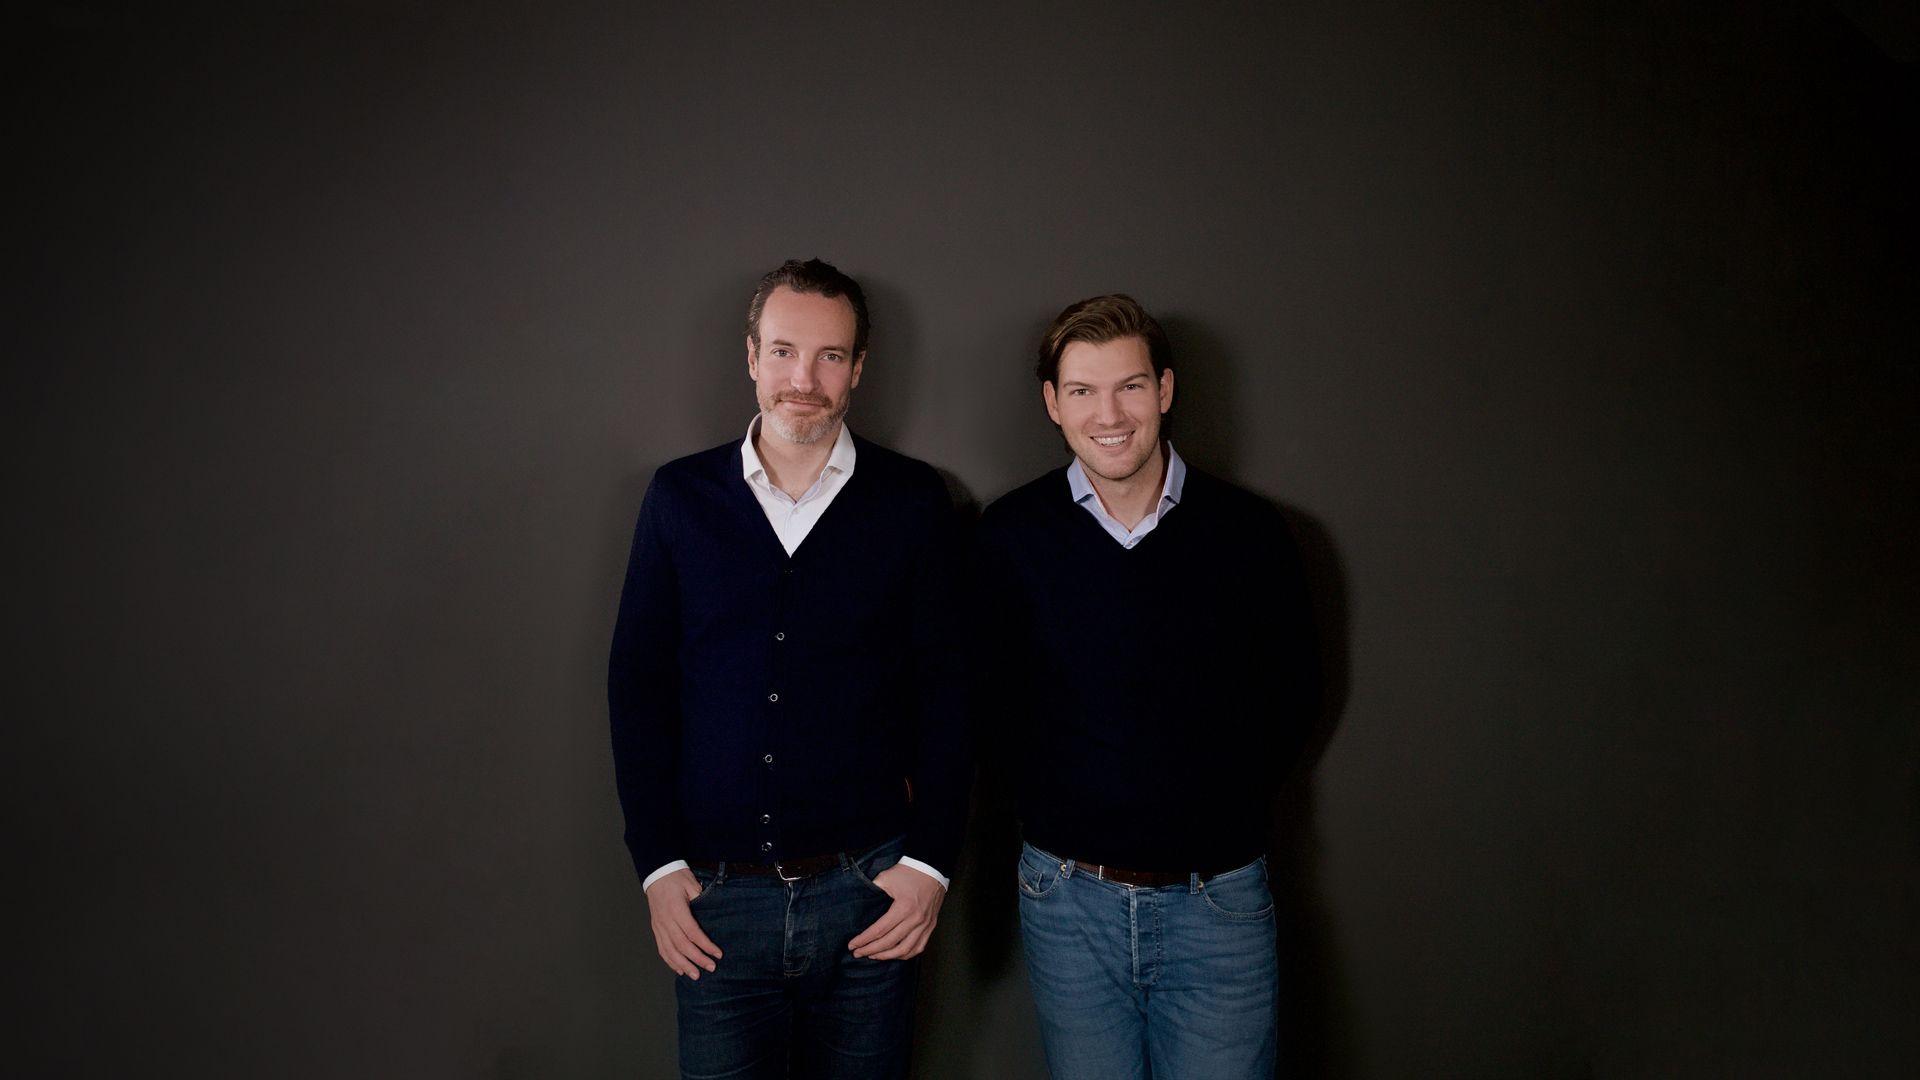 Foto de Maximilian Tayenthal y Valentin Stalf